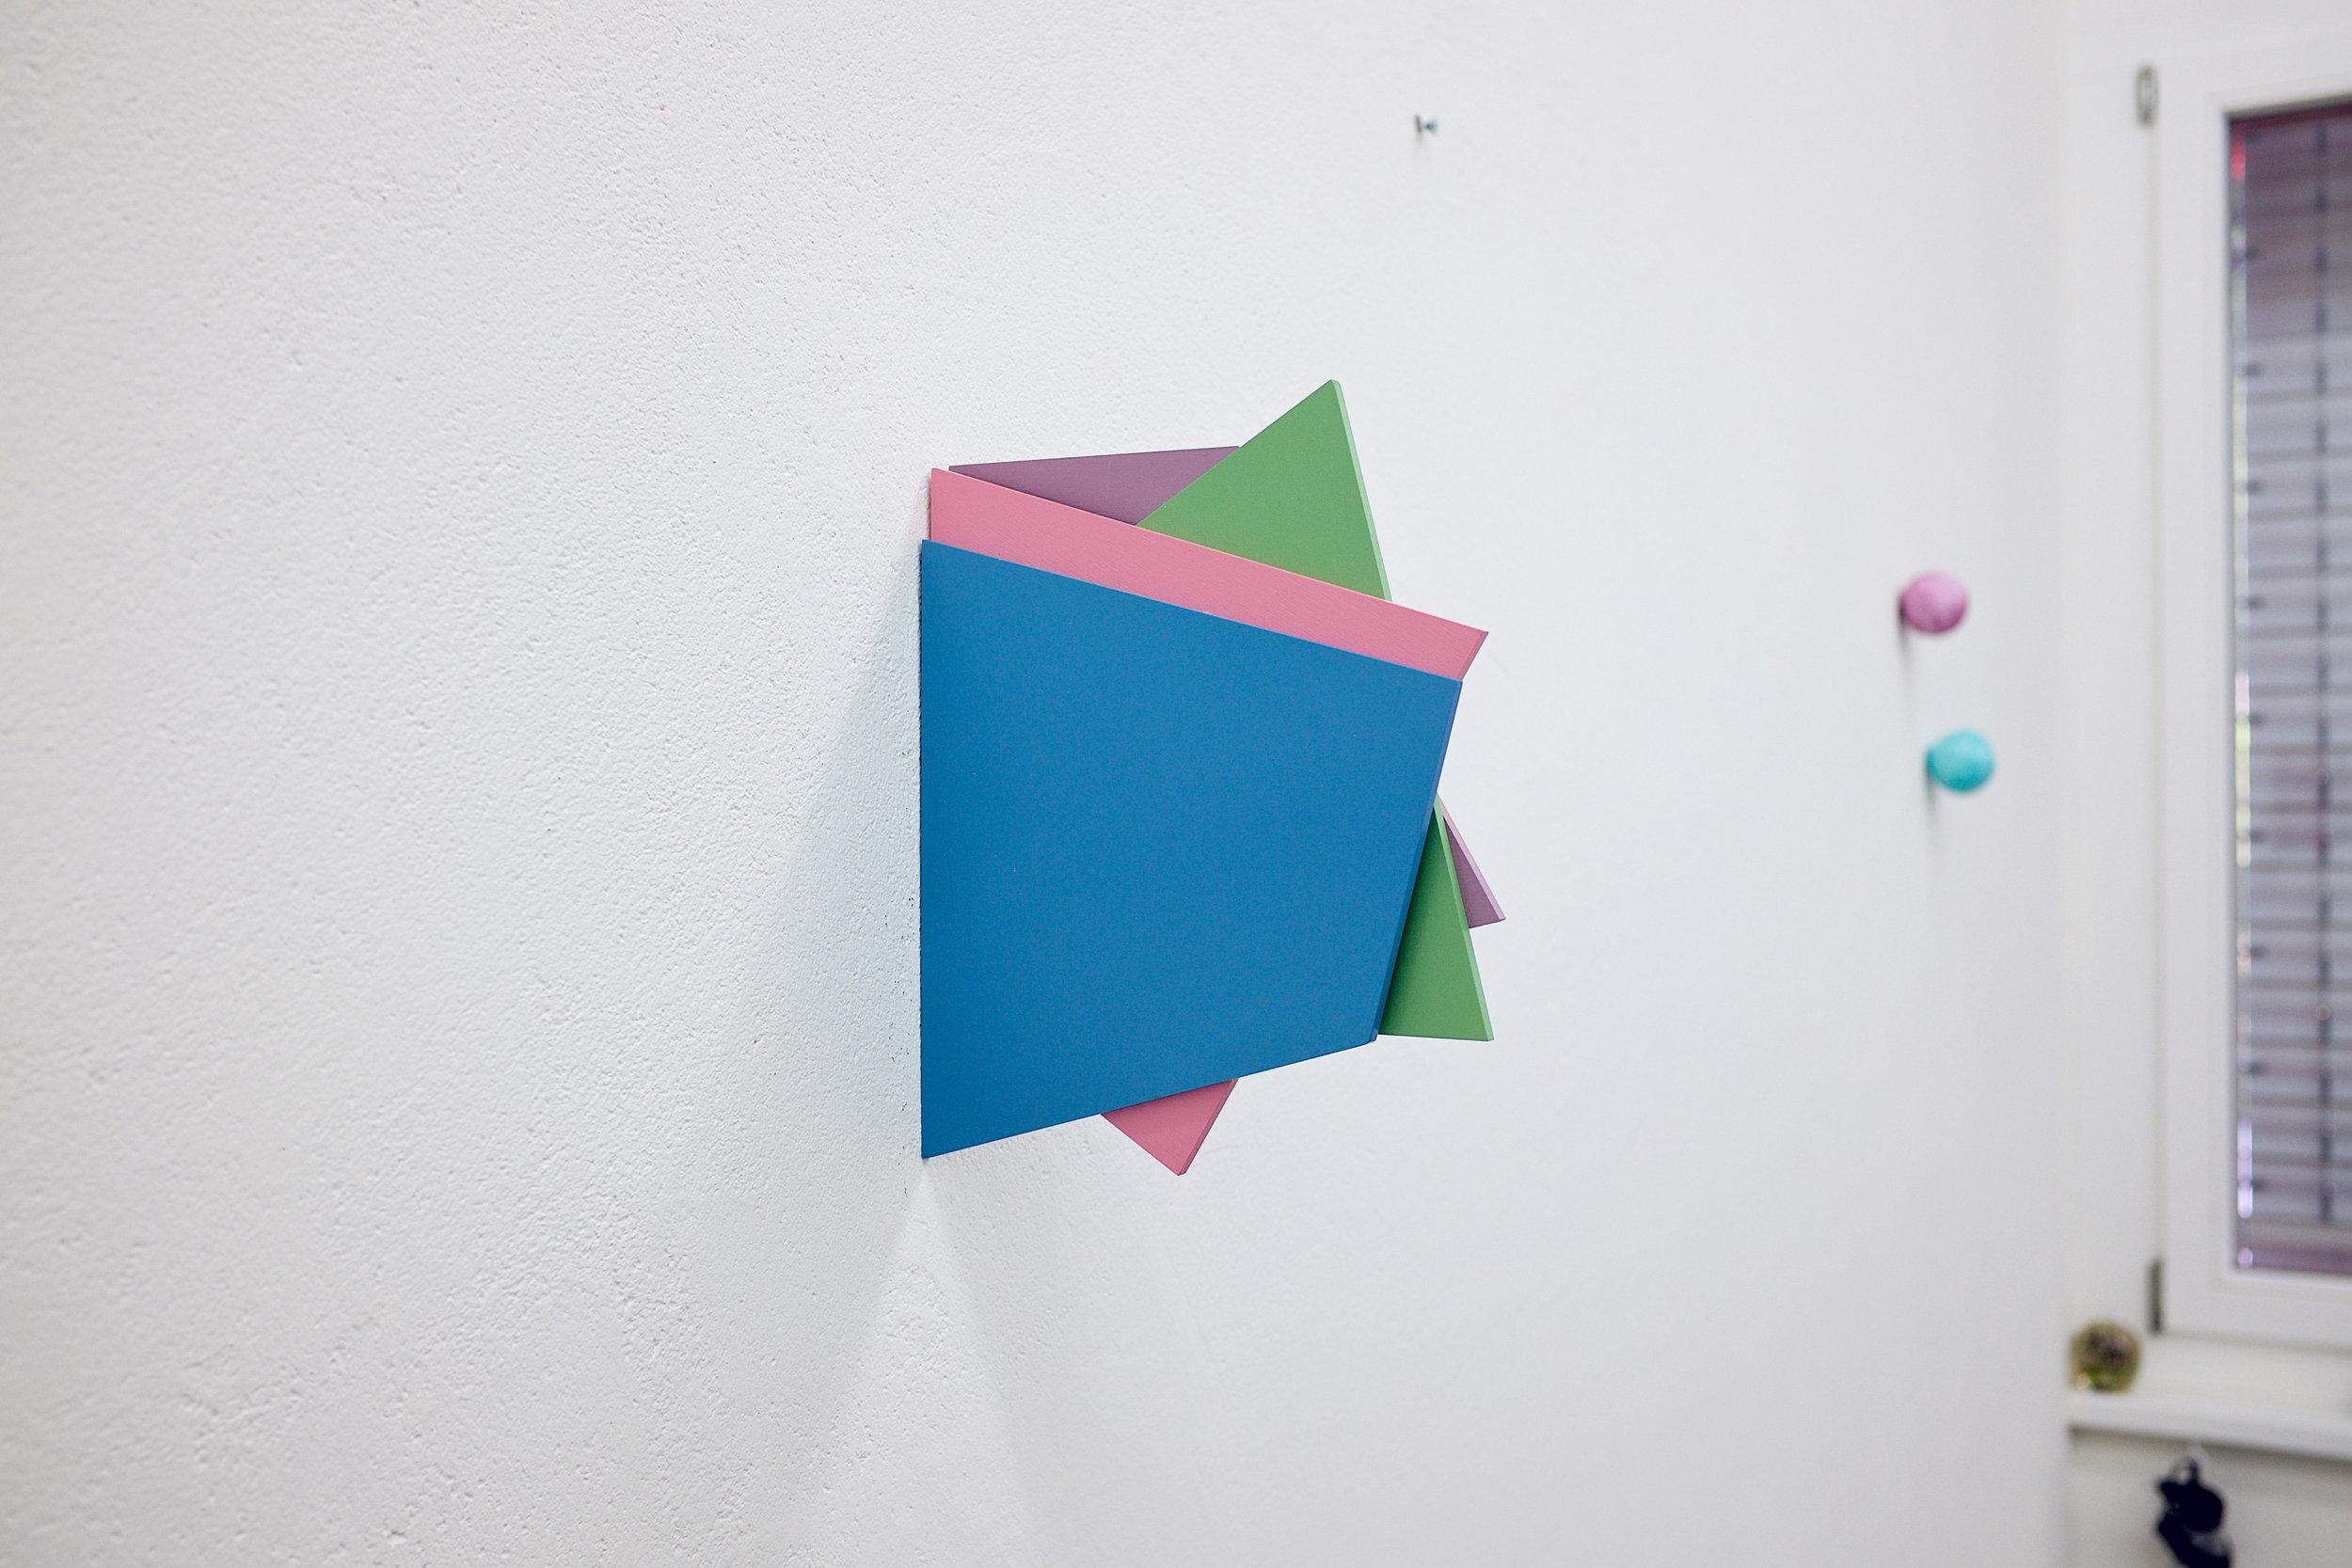 multiple nr. 2.1-4/2016 (trapez) - kunstharz auf mdf - 23 x 20 x 2 cm 180 grad drehbar